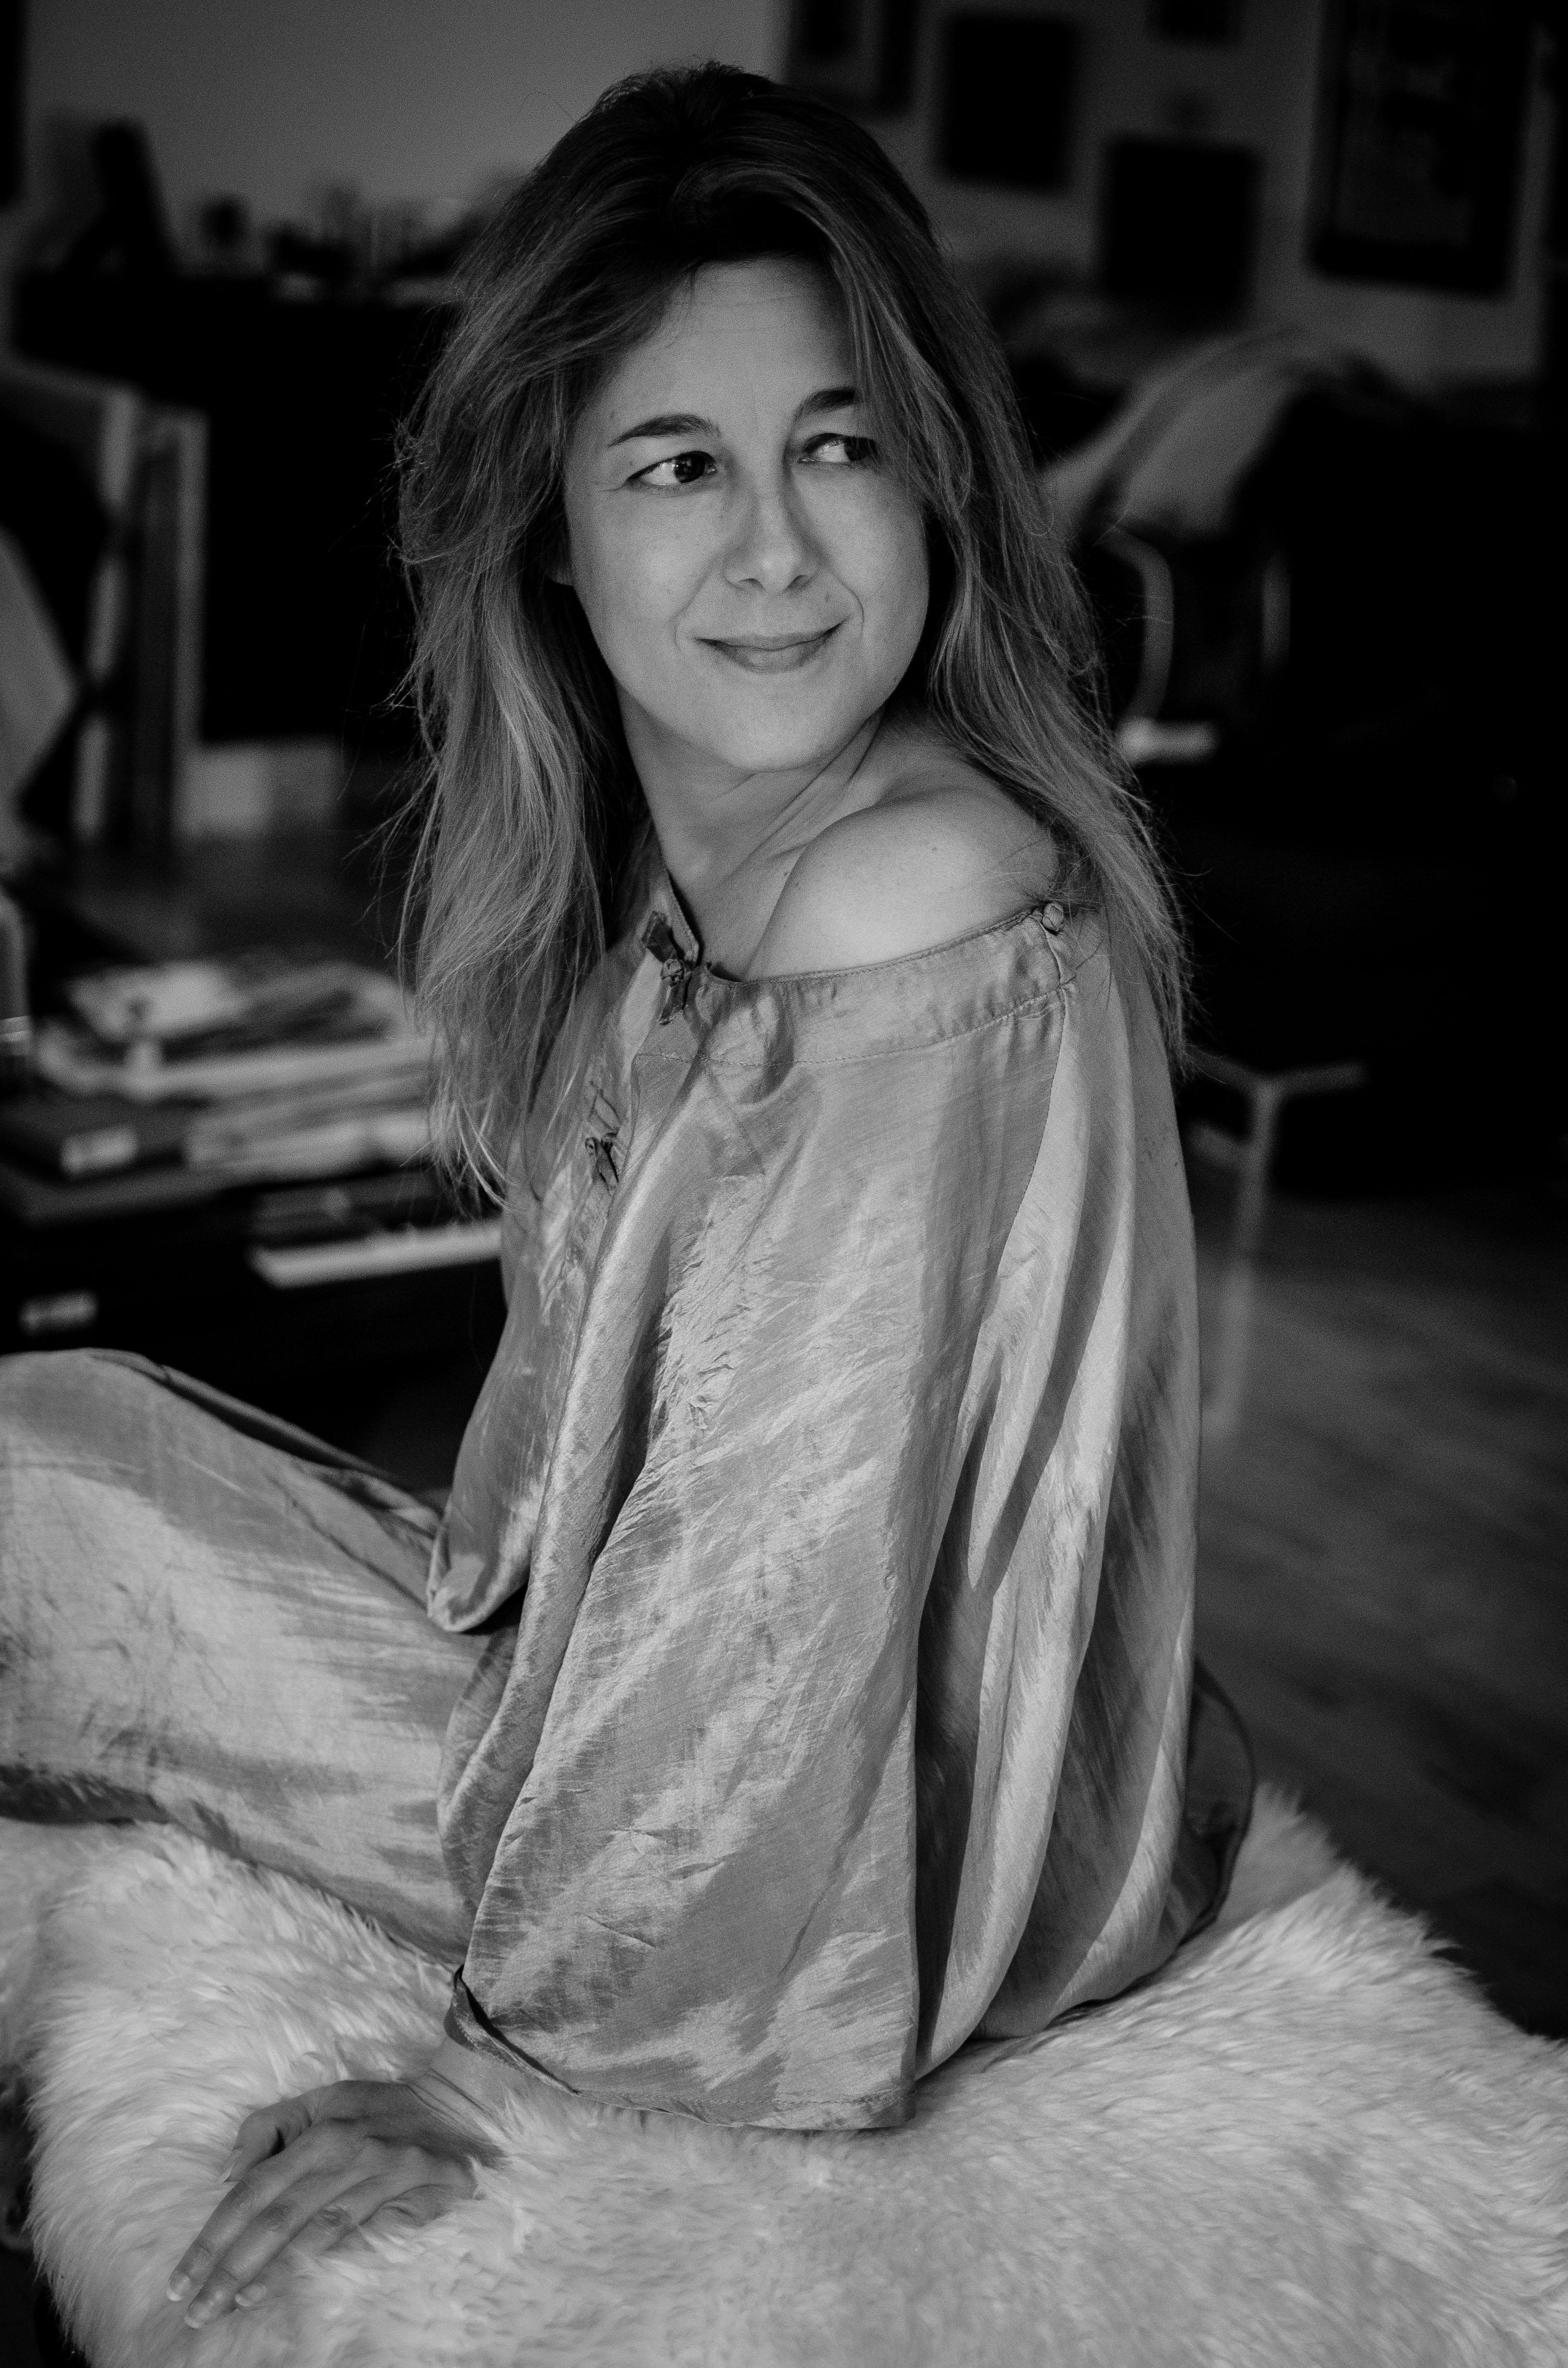 Carla Mura, foto di Chiara Leone